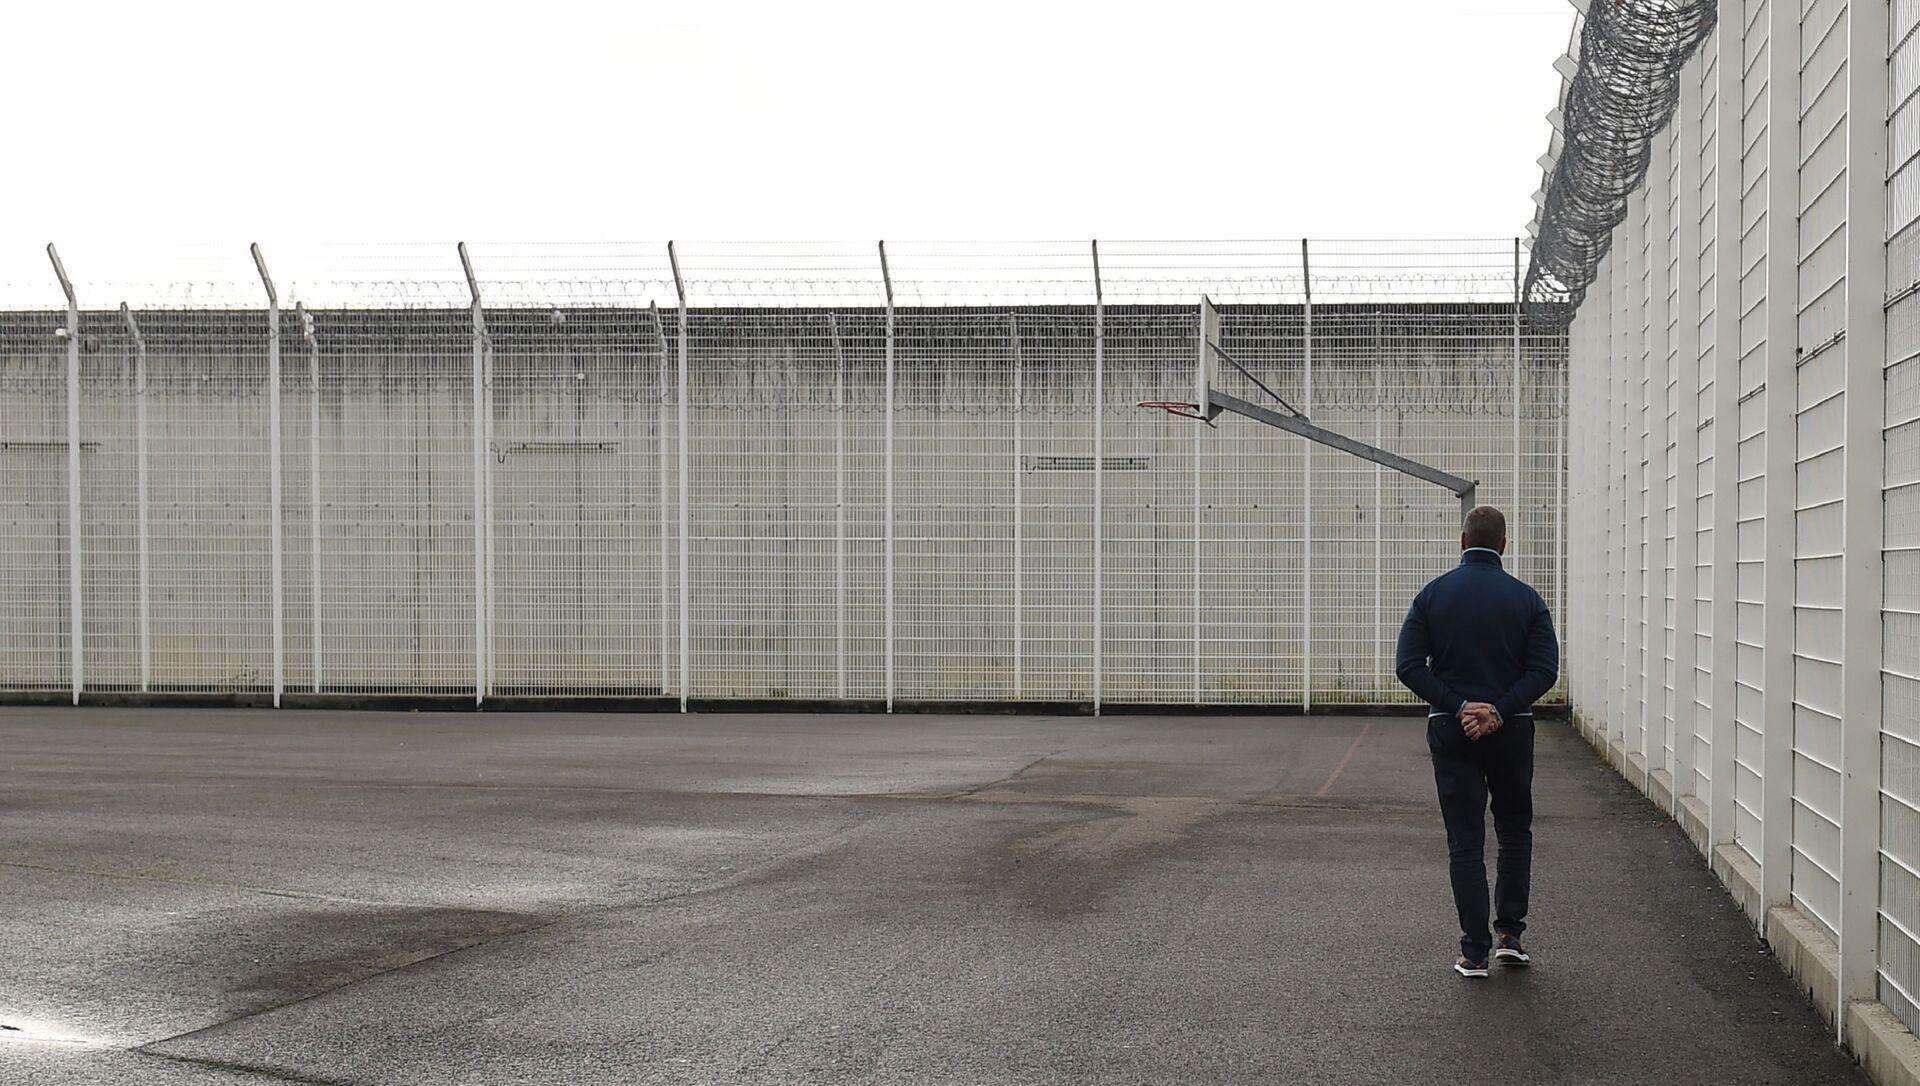 Мужчина гуляет во дворе тюрьмы, фото из архива - Sputnik Azərbaycan, 1920, 24.09.2021